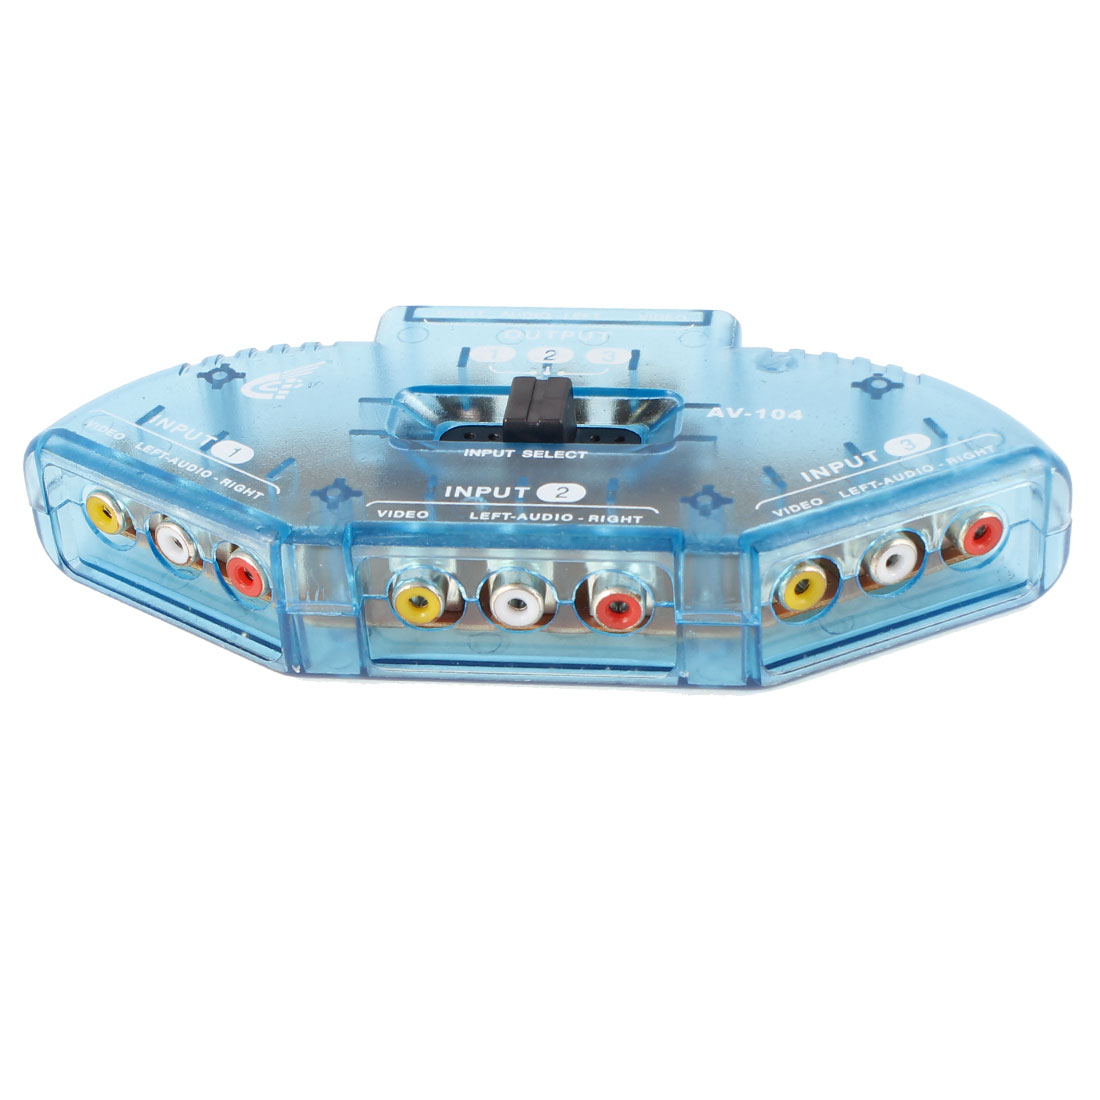 3-Way Audio Video AV RCA Switch Game Selector Box Splitter Clear Blue w AV Cable